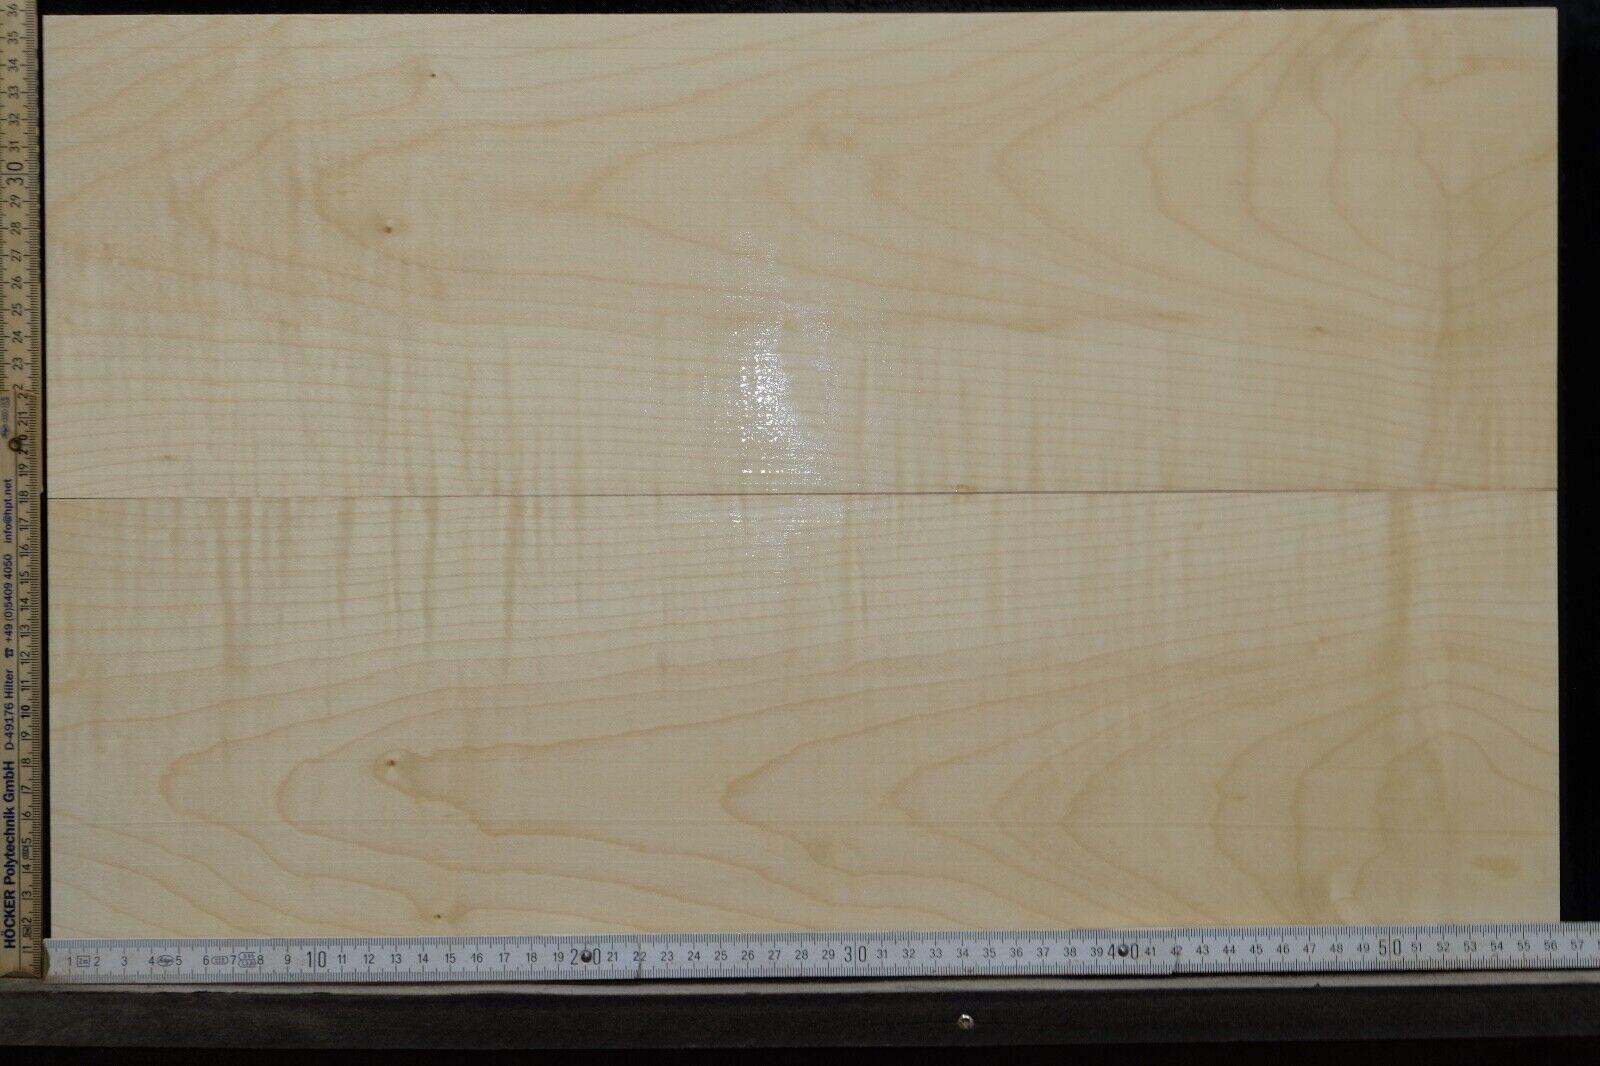 Tonewood Riegel Ahorn Flamed Maple 7,0 mm Aufleimer Guitar Tonholz Droptop 455